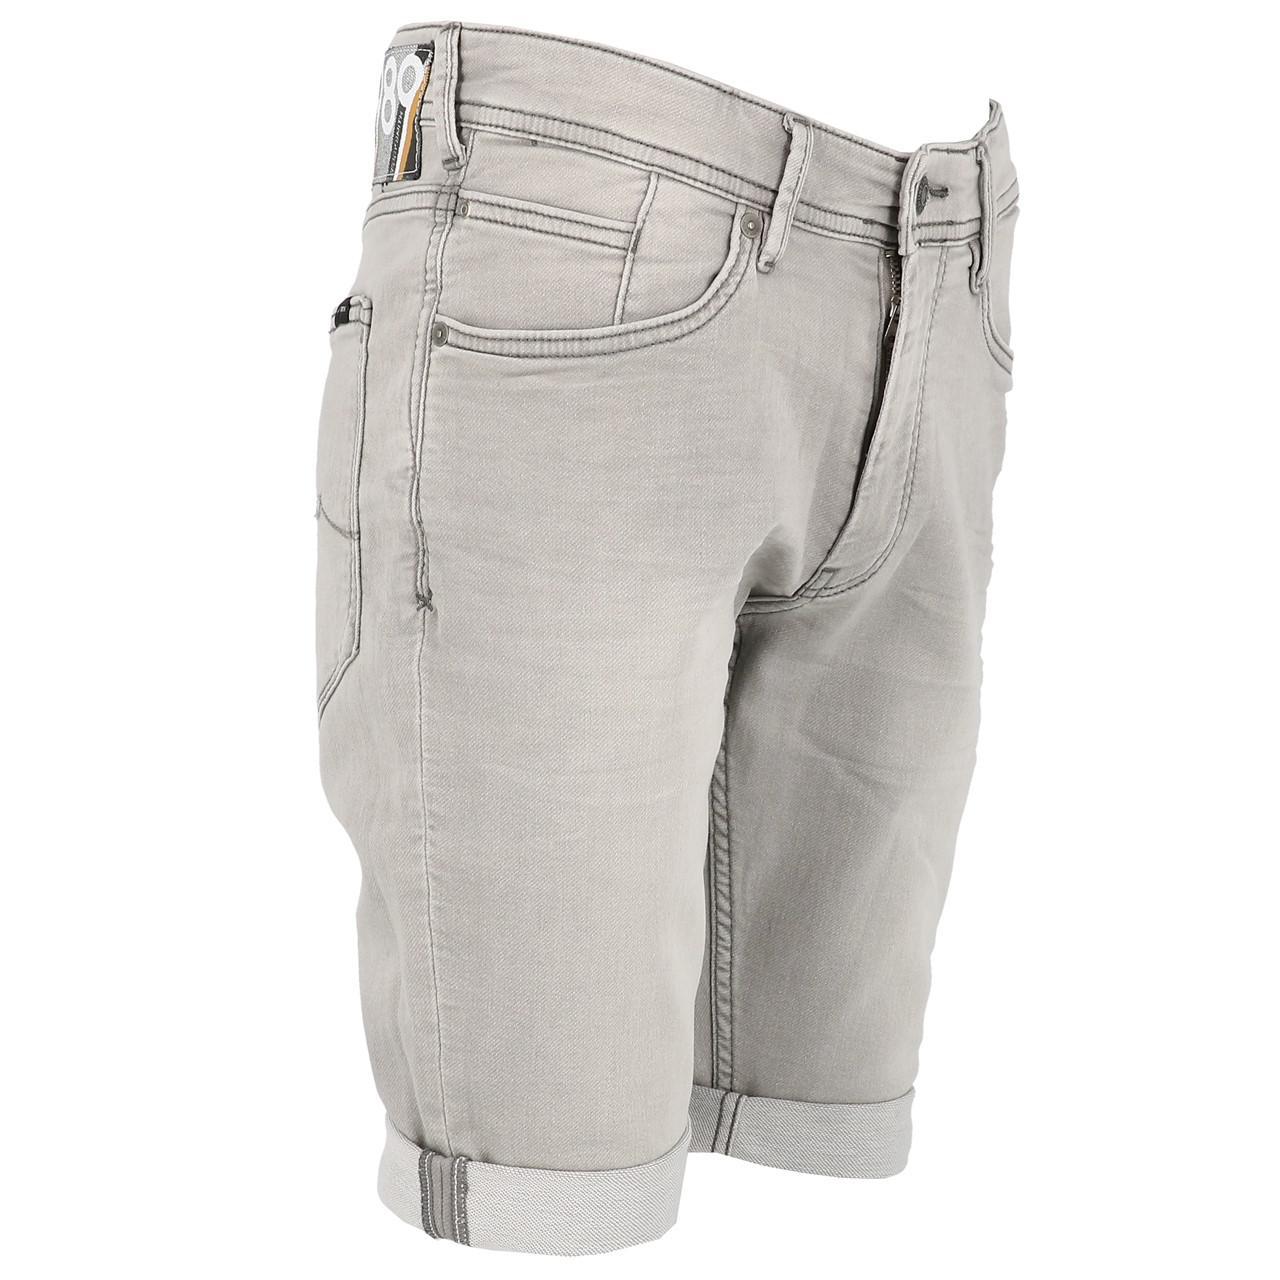 Bermuda-Shorts-Teddy-smith-Scotty-3-Grey-Shorts-Grey-29920-New thumbnail 4